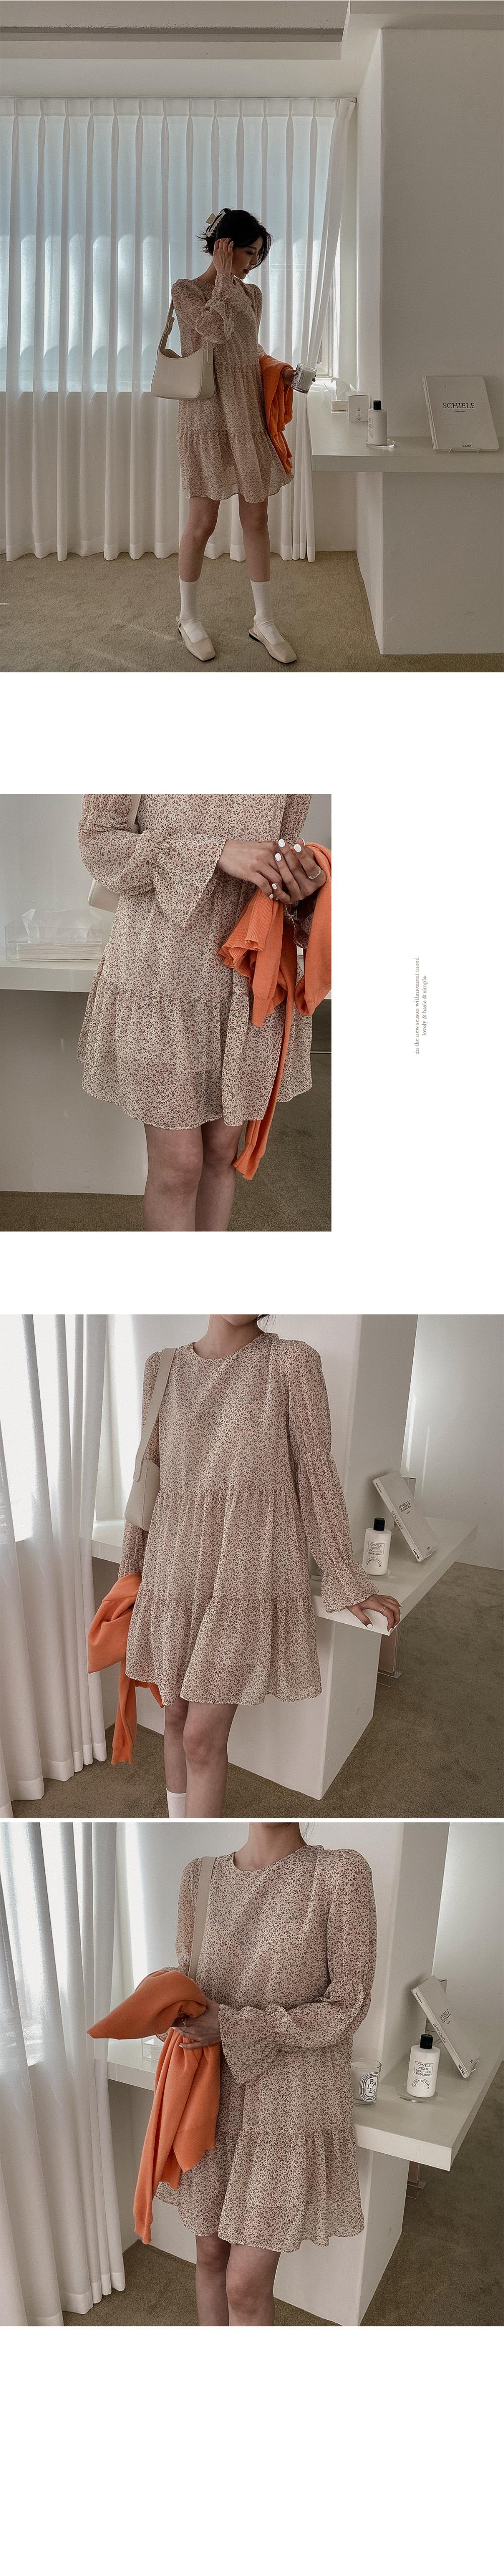 Prom D Flower Dress -2color